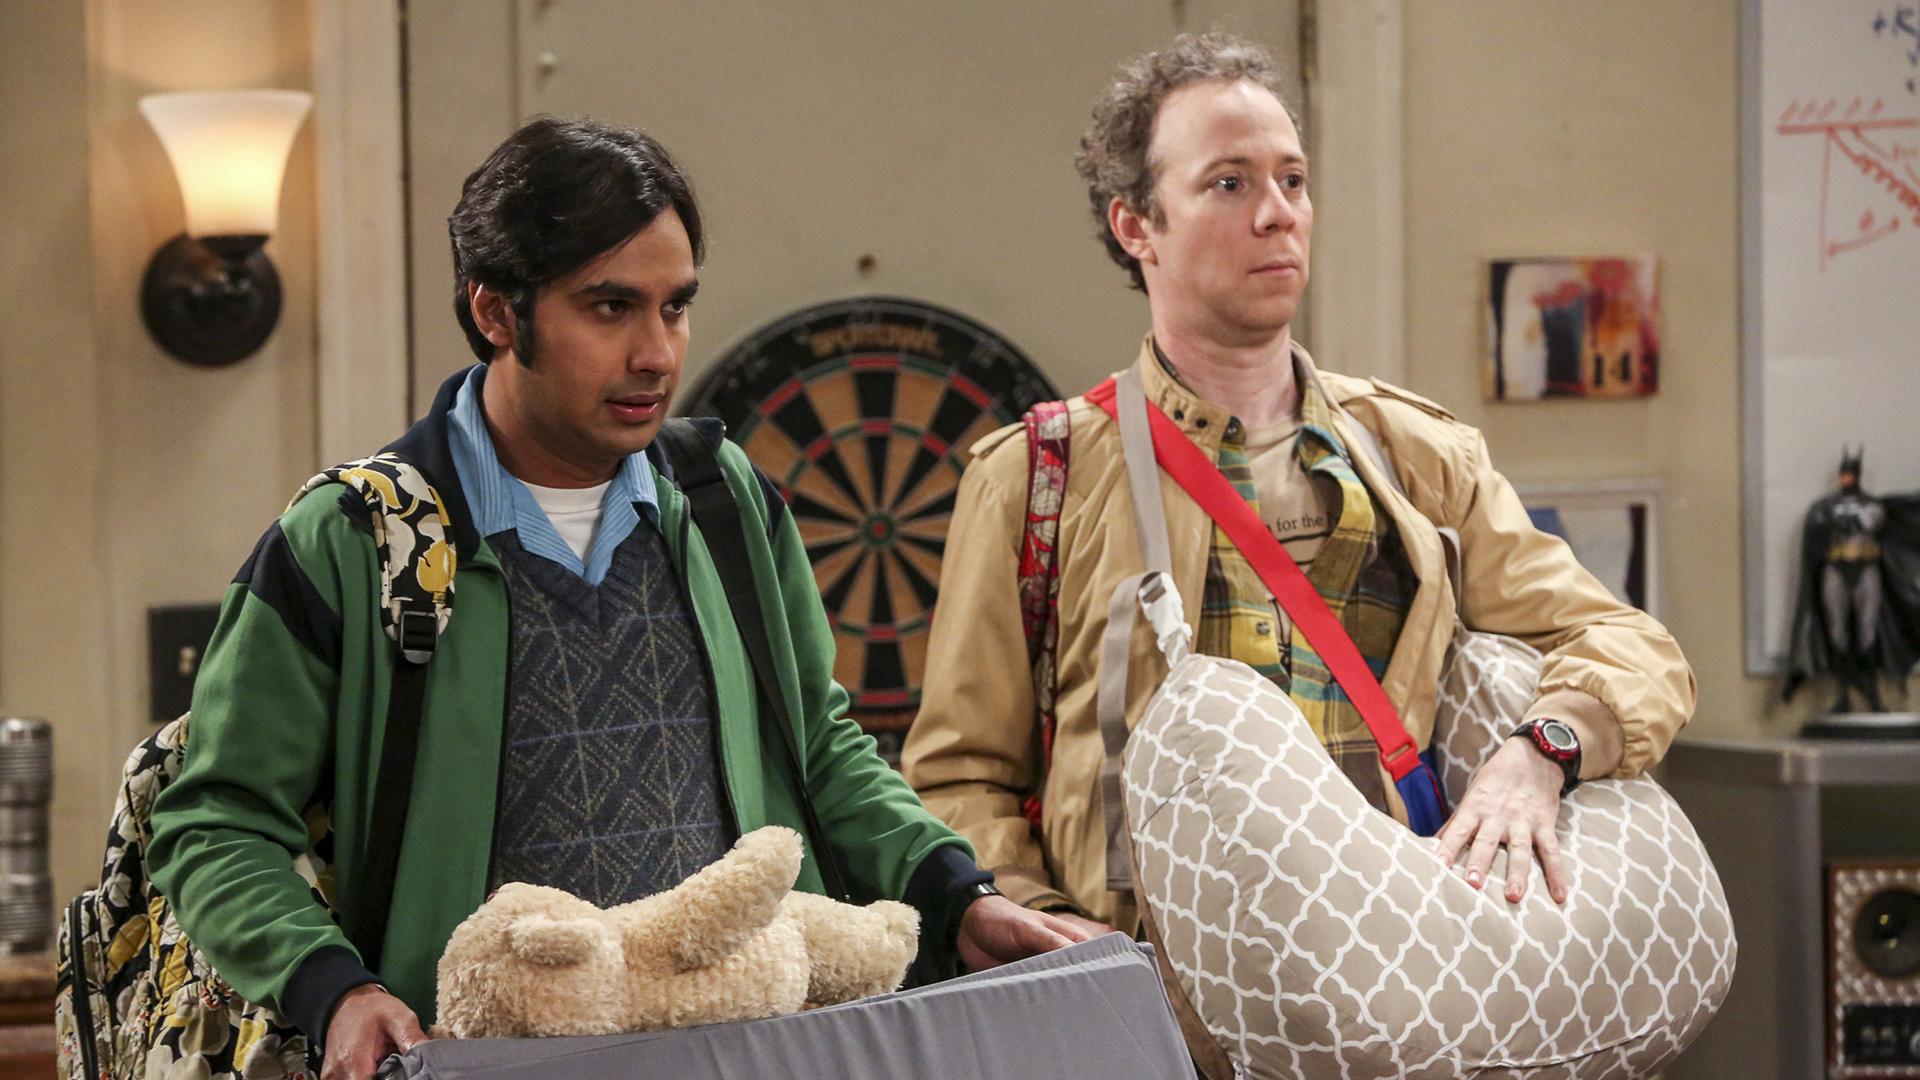 Raj and Stuart act as Halley's